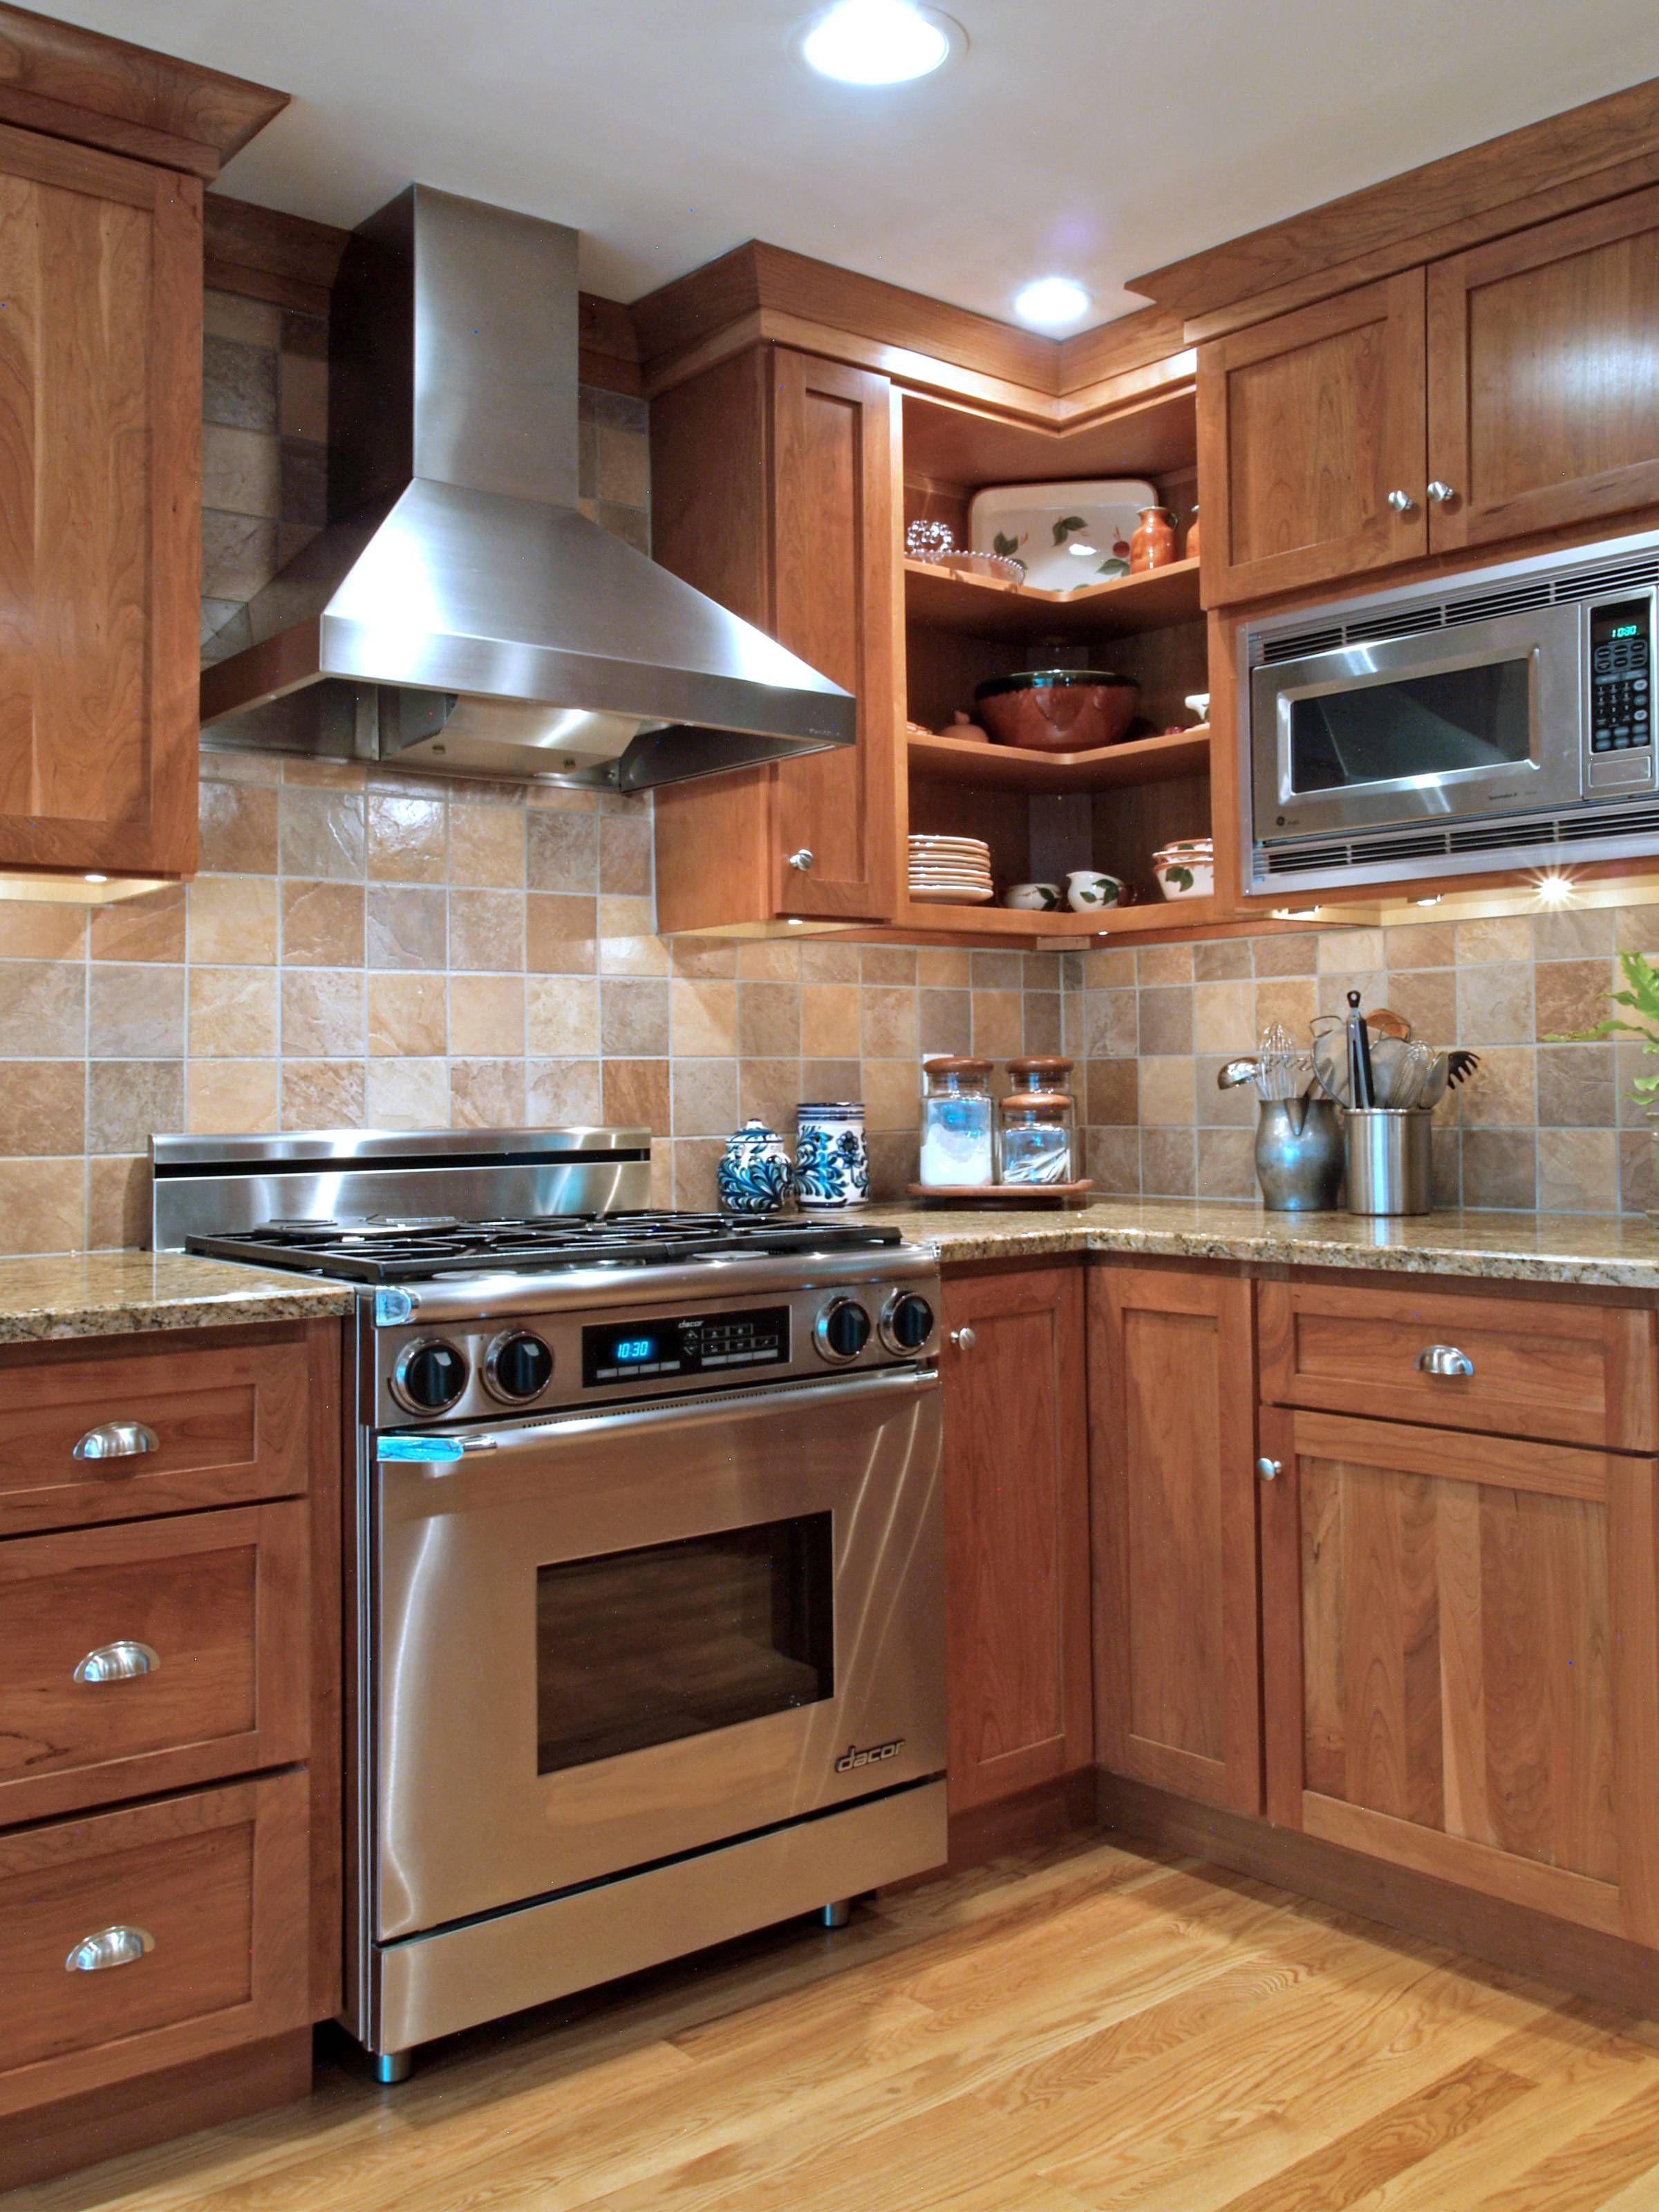 Image Result For Honey Maple Shaker Kitchen Cabinets Kitchenbacksplashideasforbrowncabinet Kitchen Backsplash Trends Kitchen Backsplash Designs Kitchen Design